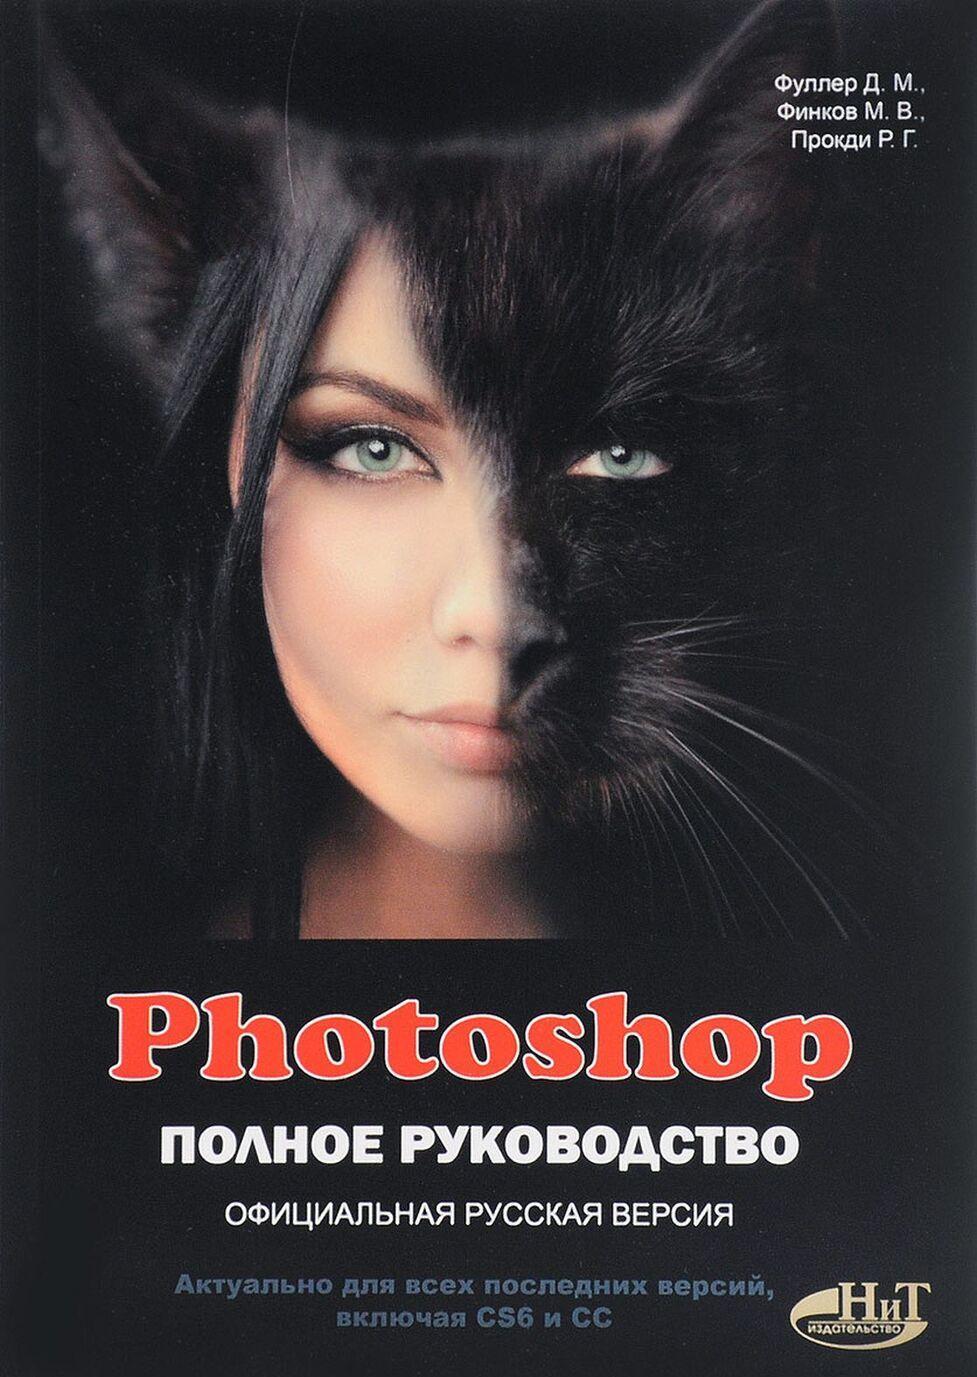 PHOTOSHOP. Polnoe rukovodstvo. Ofitsialnaja russkaja versija, 3-e izdanie